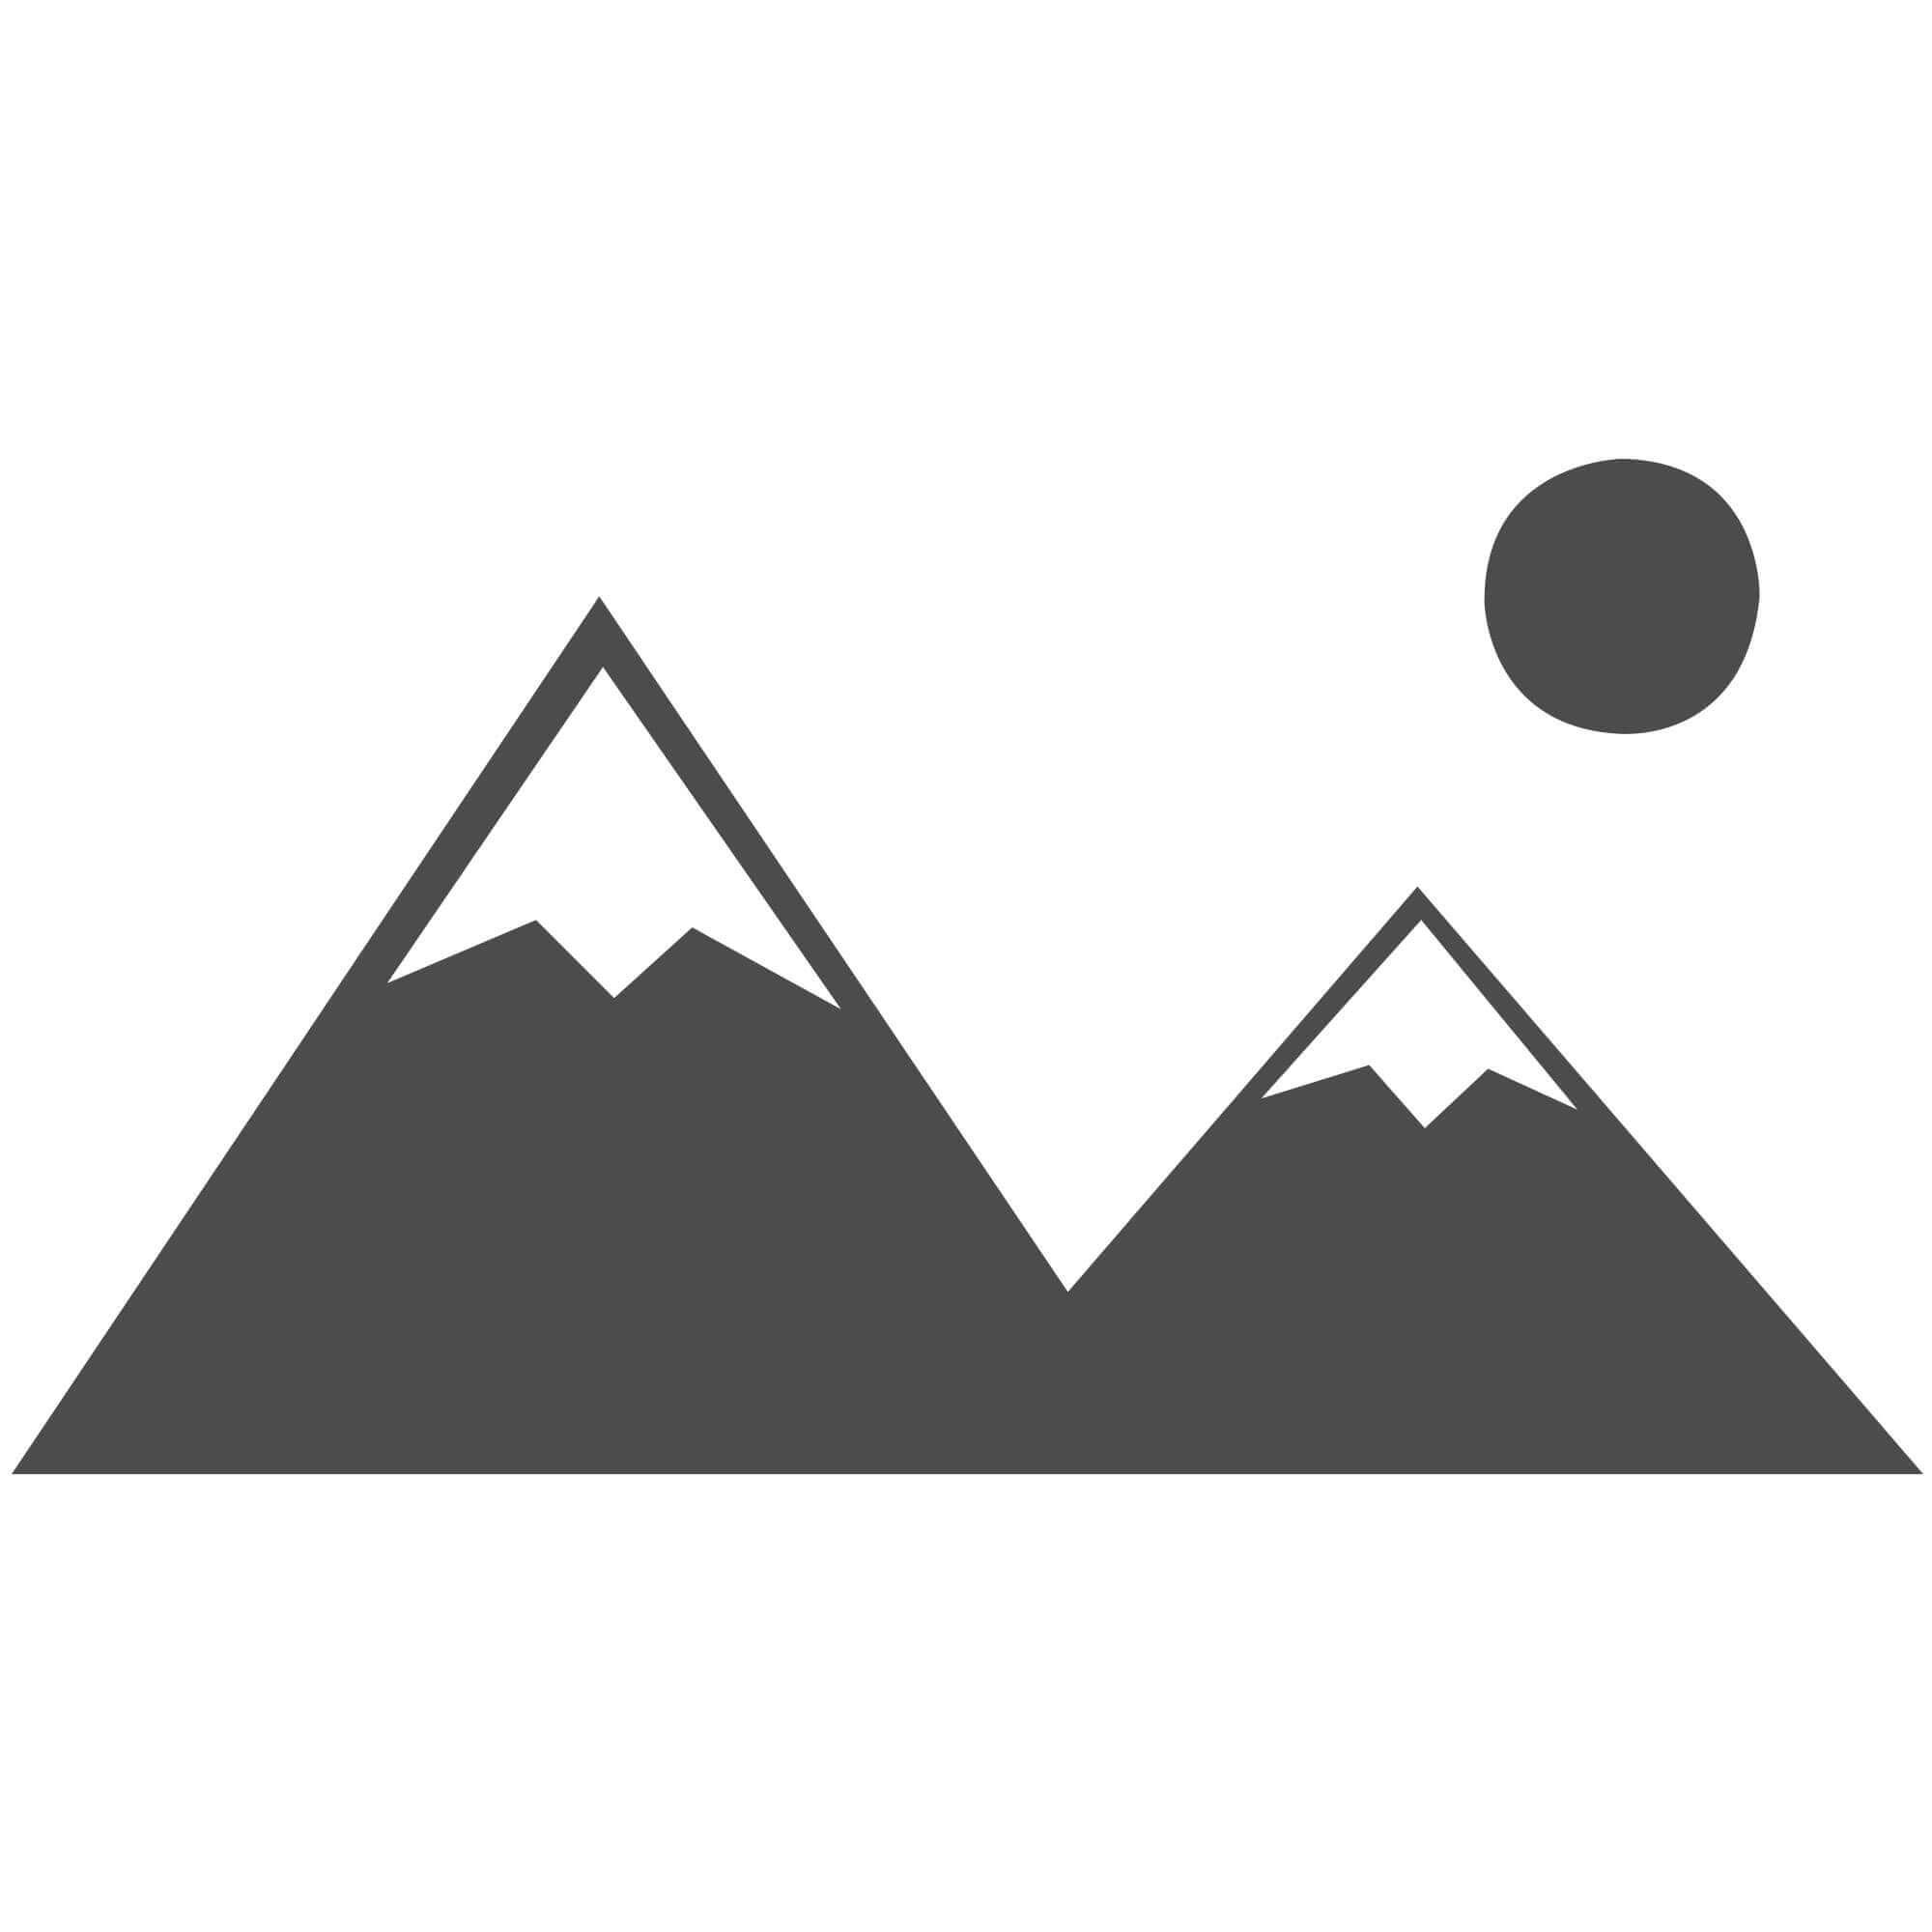 "Kashqai Traditional Pazyryk Persian Design Rug - 4301/300-135 x 200 cm (4'5"" x 6'7"")"